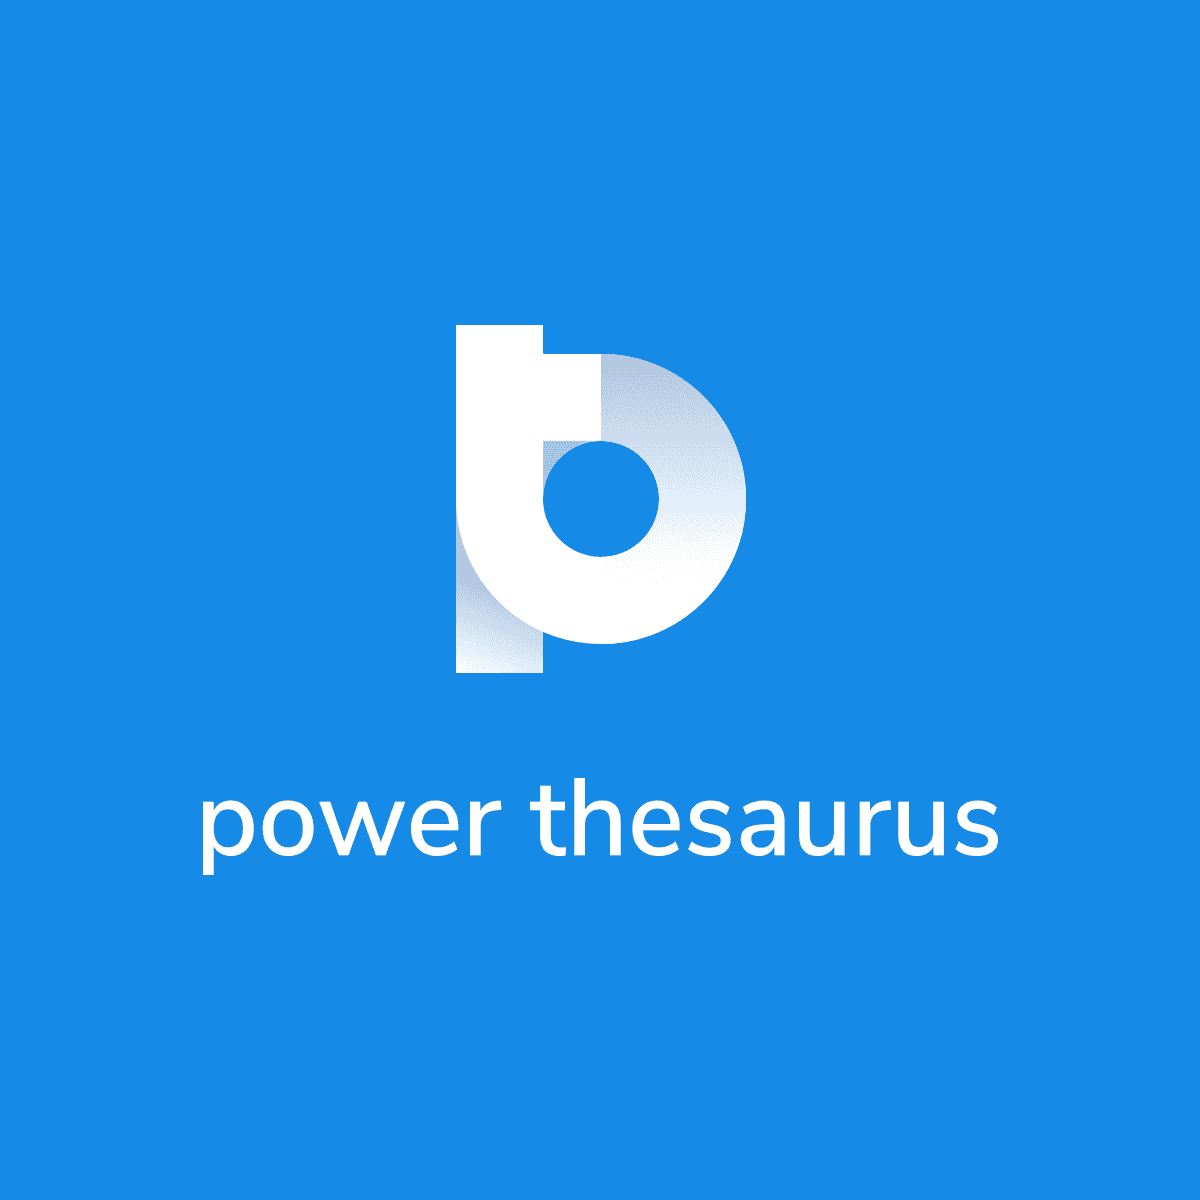 www.powerthesaurus.org